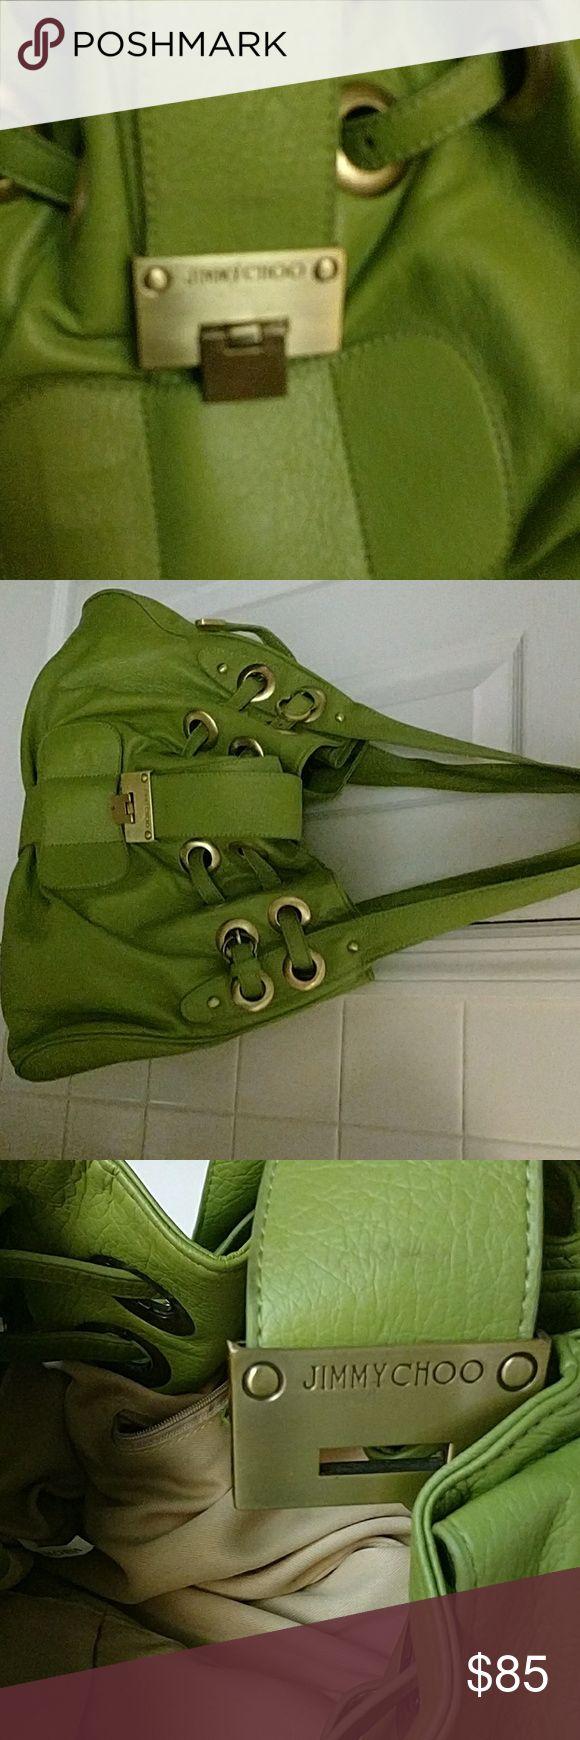 Leather olive green Jimmy Choo handbag Olive green leather drawstring closure gold buckles tan lining Jimmy Choo Bags Shoulder Bags